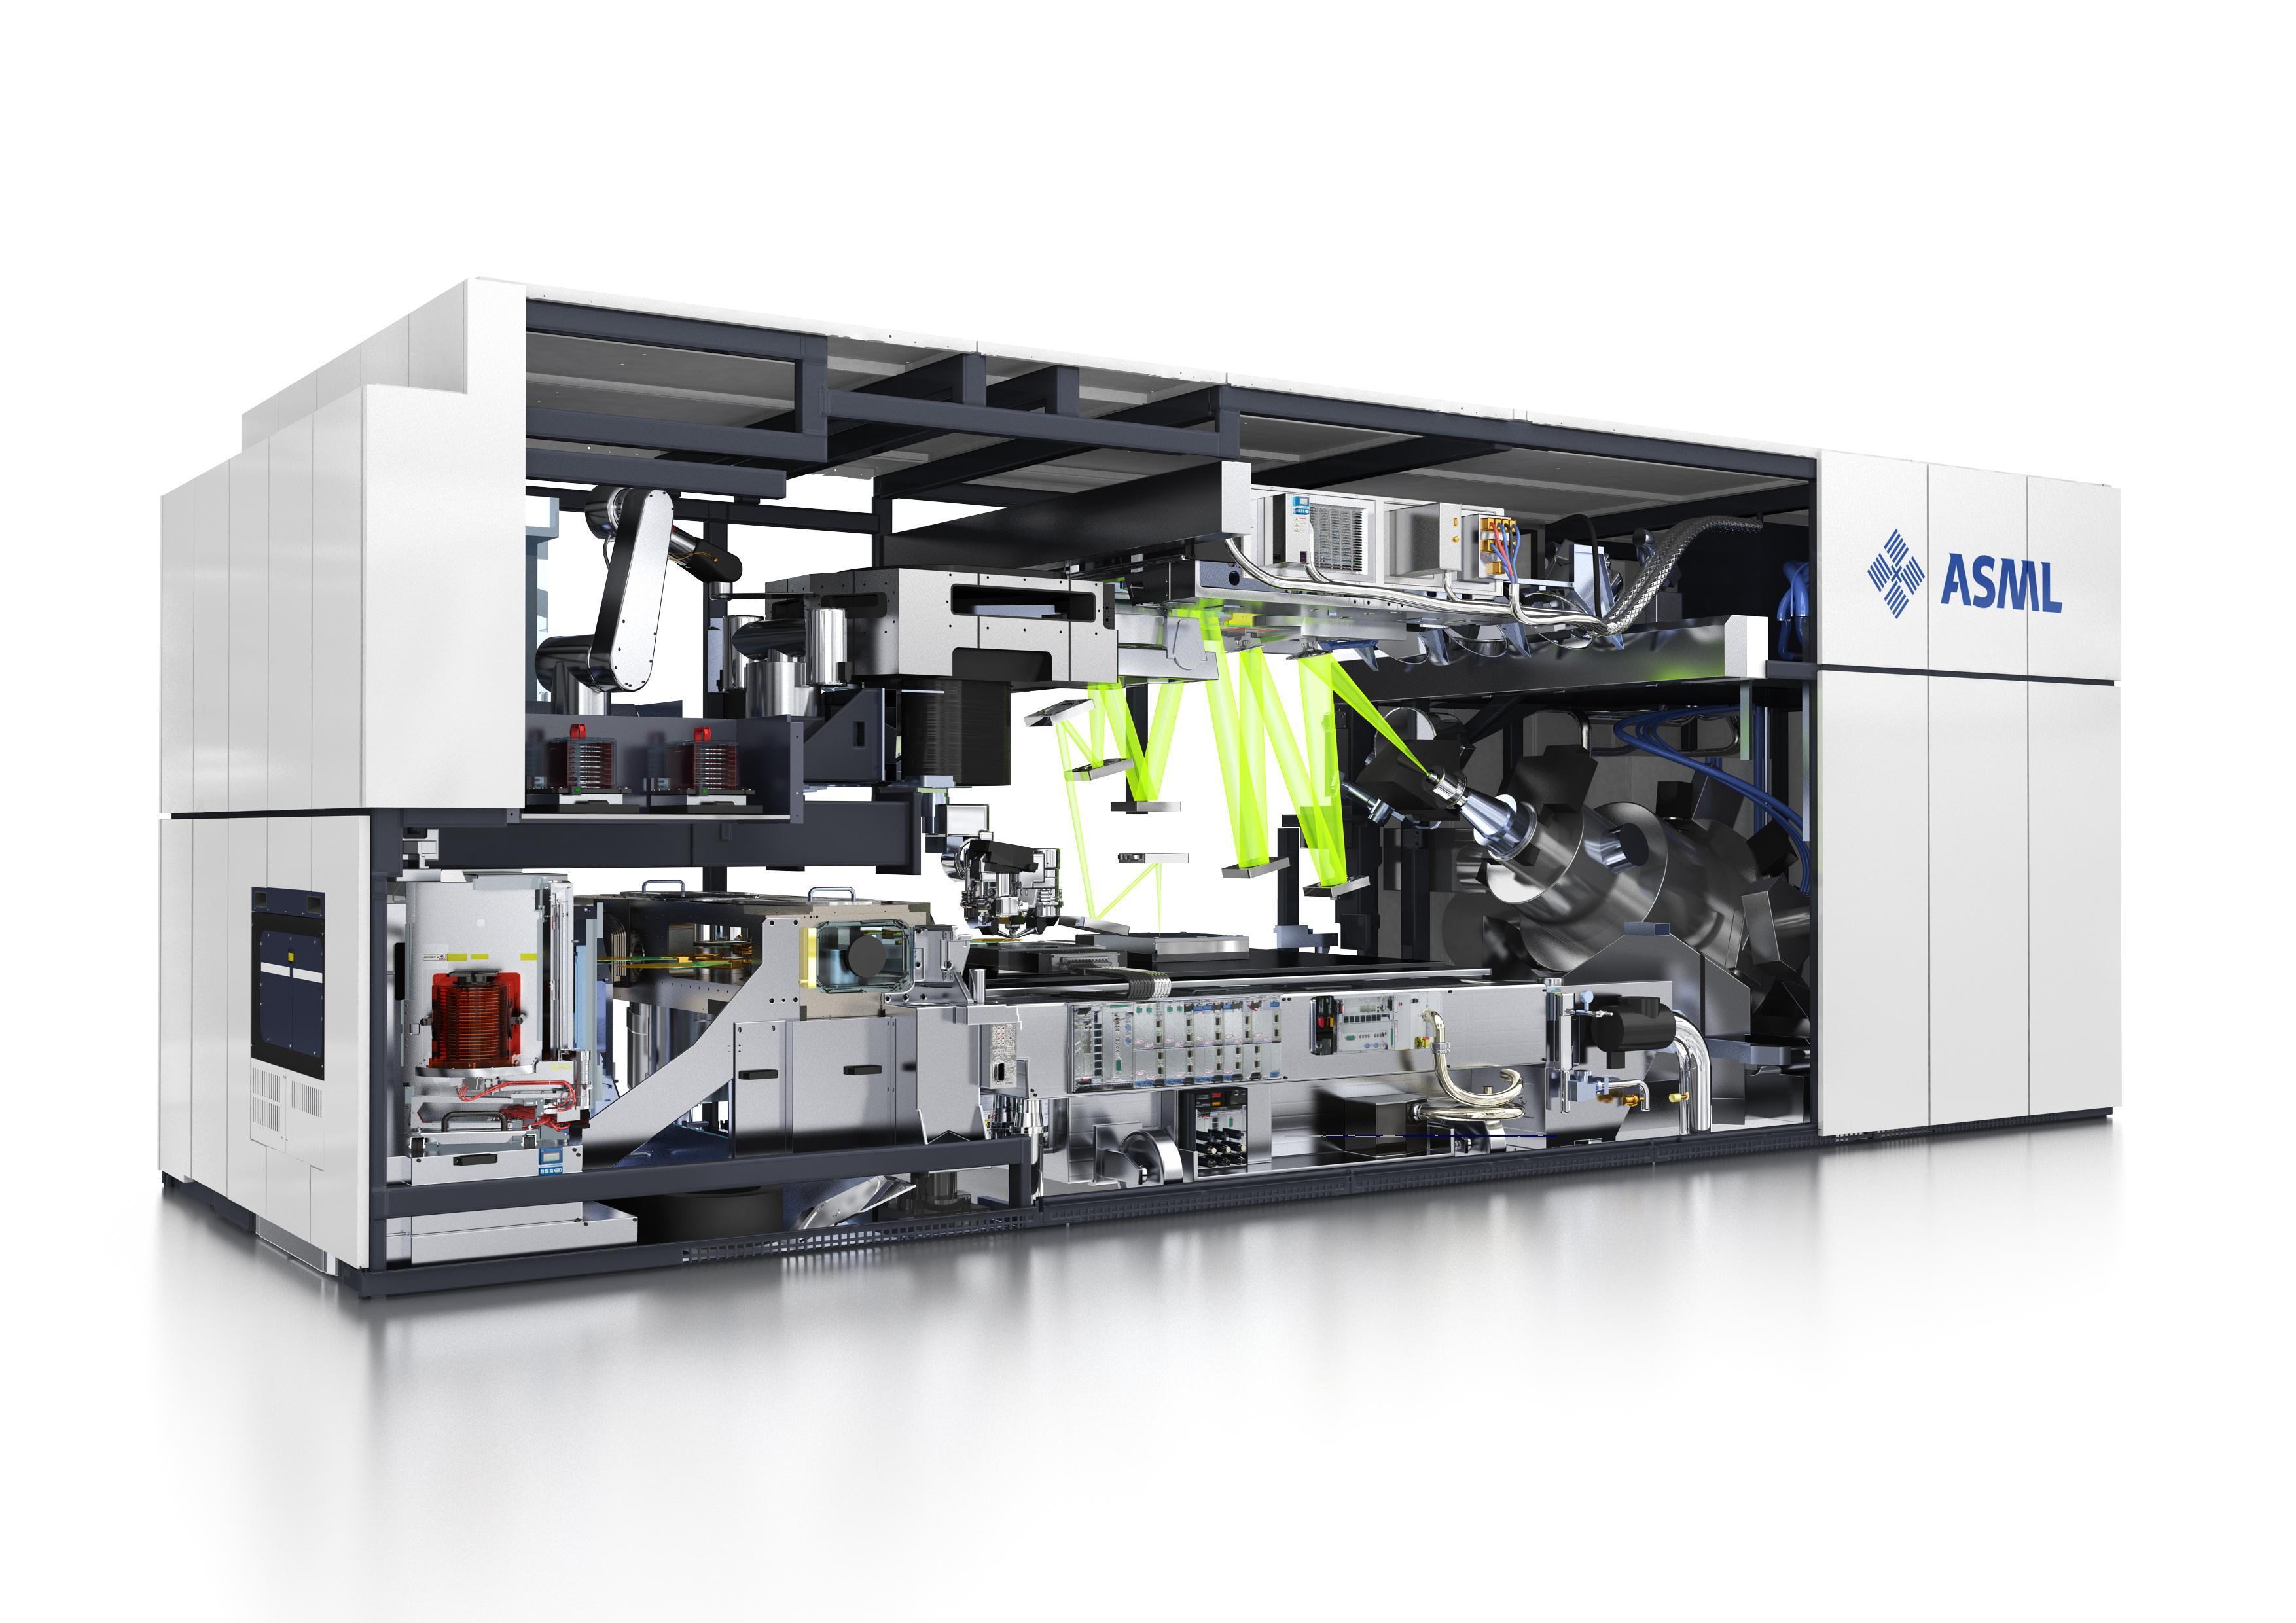 En av ASMLs fotolitografimaskiner, maskiner som tar unna prosessen der kretsen belyses.Foto: ASML